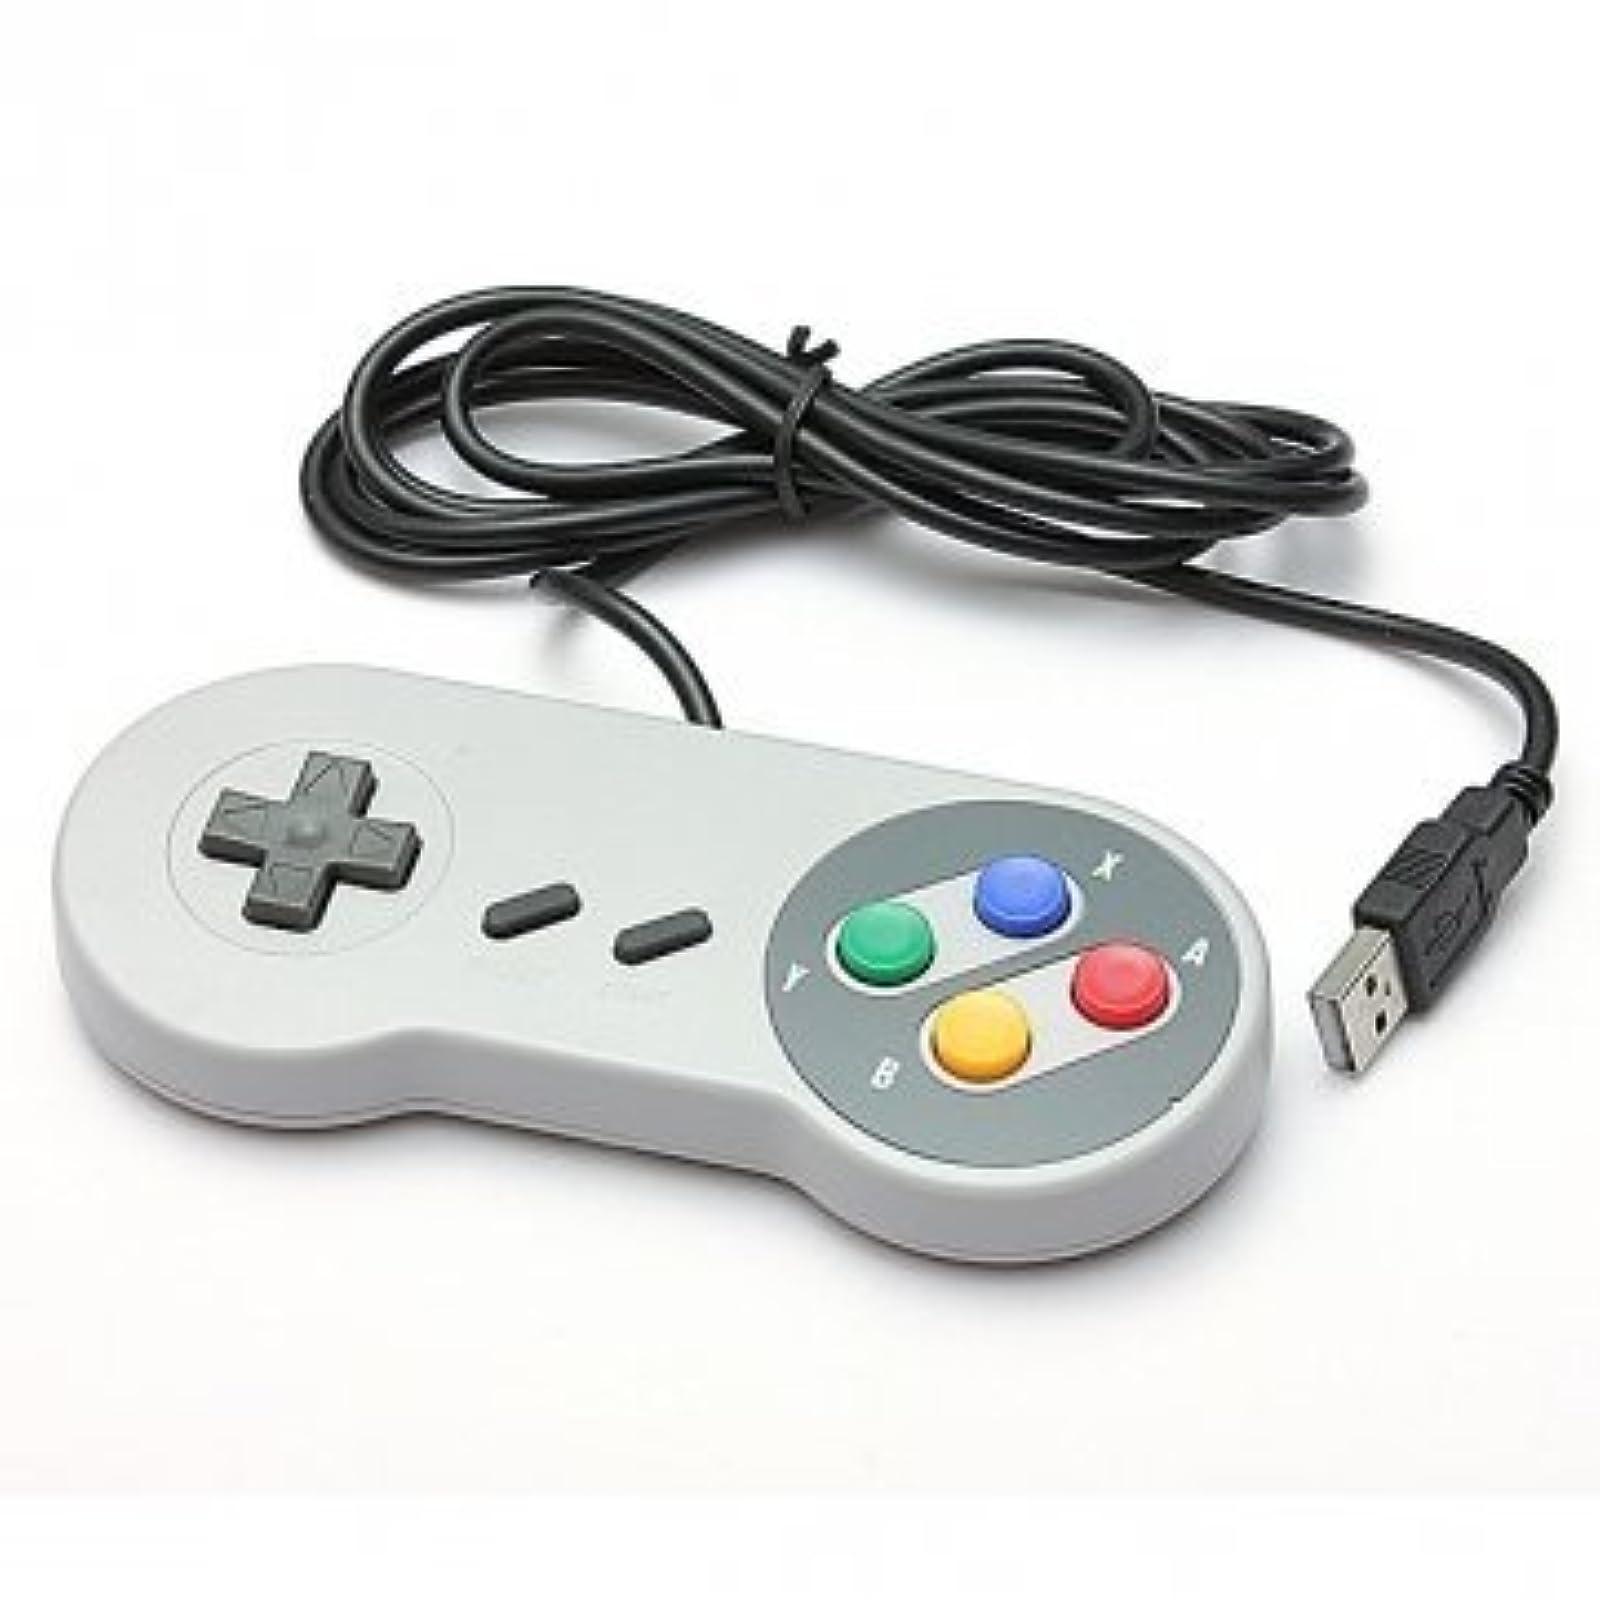 SNES USB Famicom Colored Super Nintendo Style Controller For Pc/mac